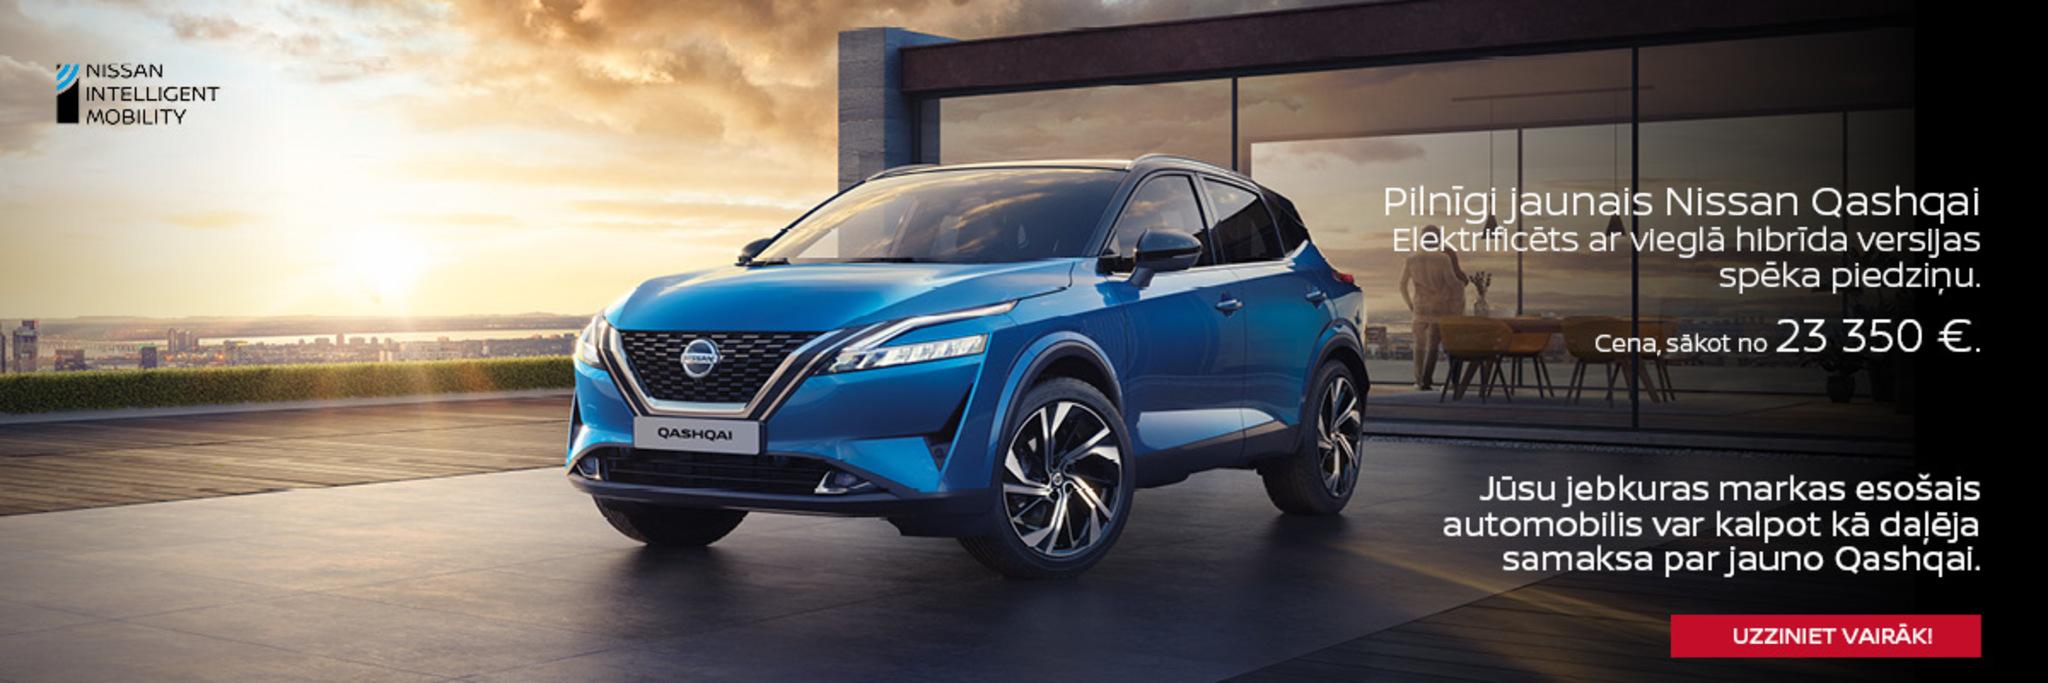 Nissan Qashqai rudens kamapņa